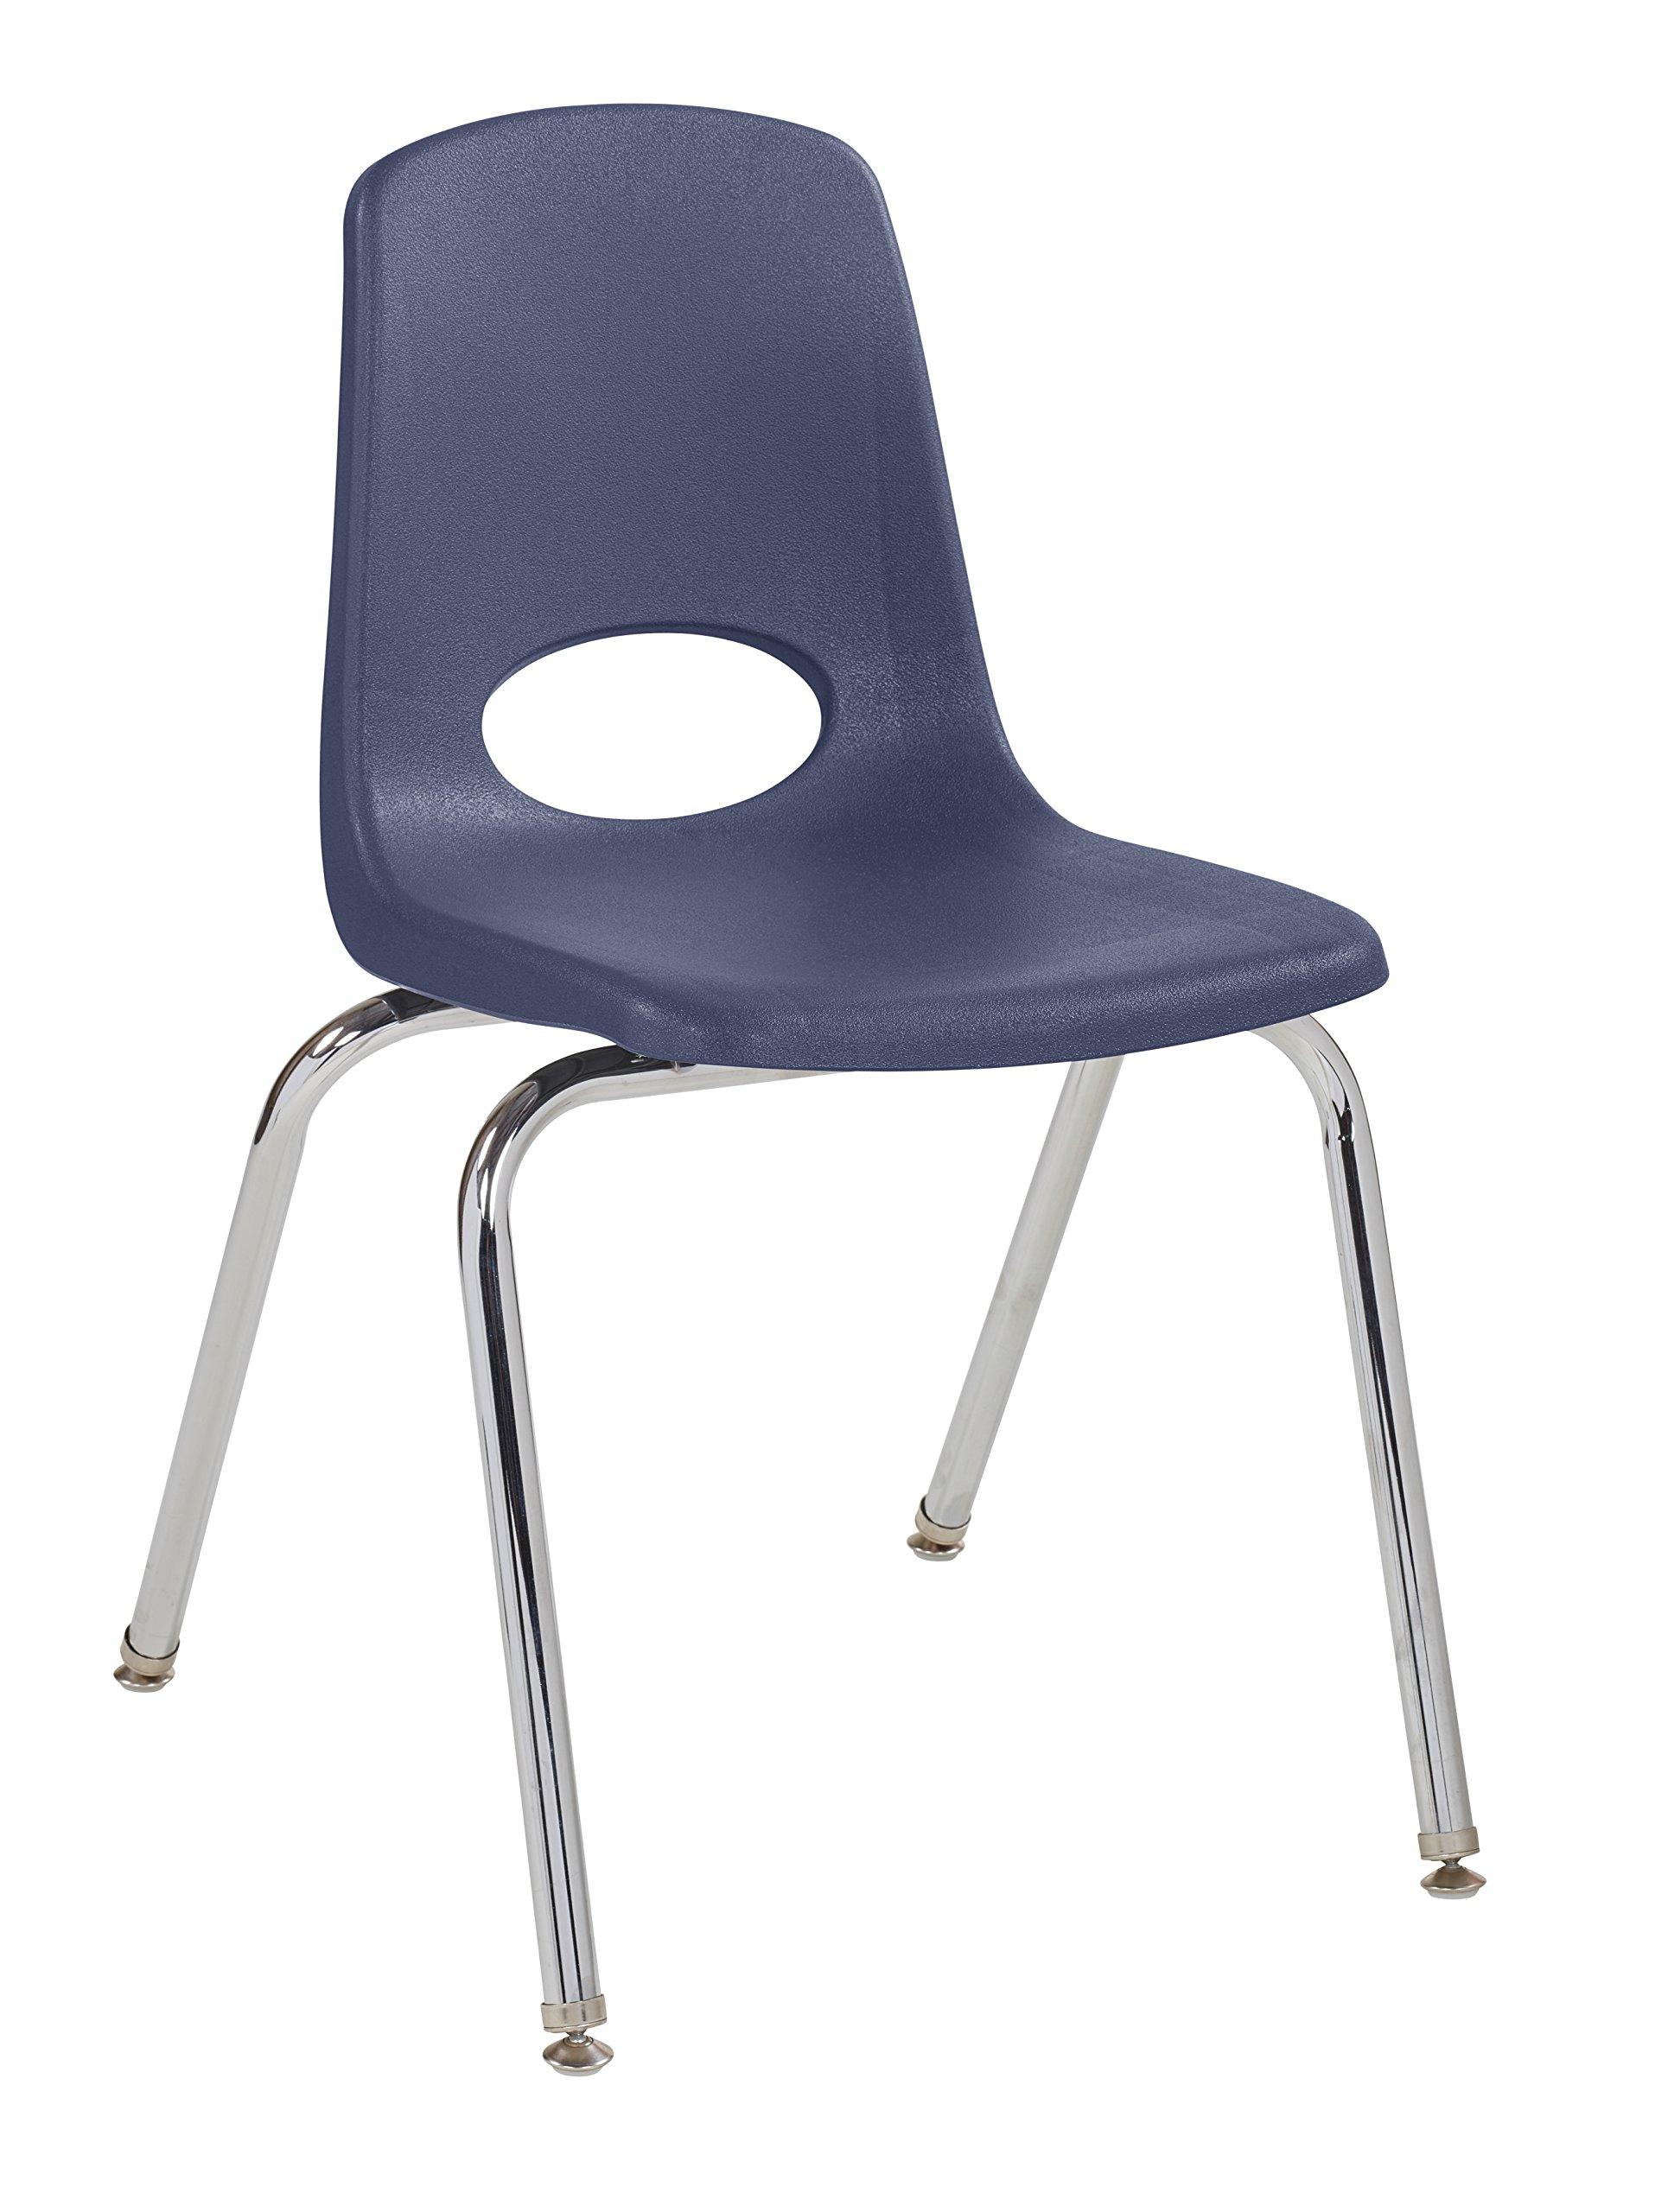 ECR4Kids 18'' School Stack Chair, Chrome Legs with Nylon Swivel Glides, Navy (5-Pack) by ECR4Kids (Image #1)